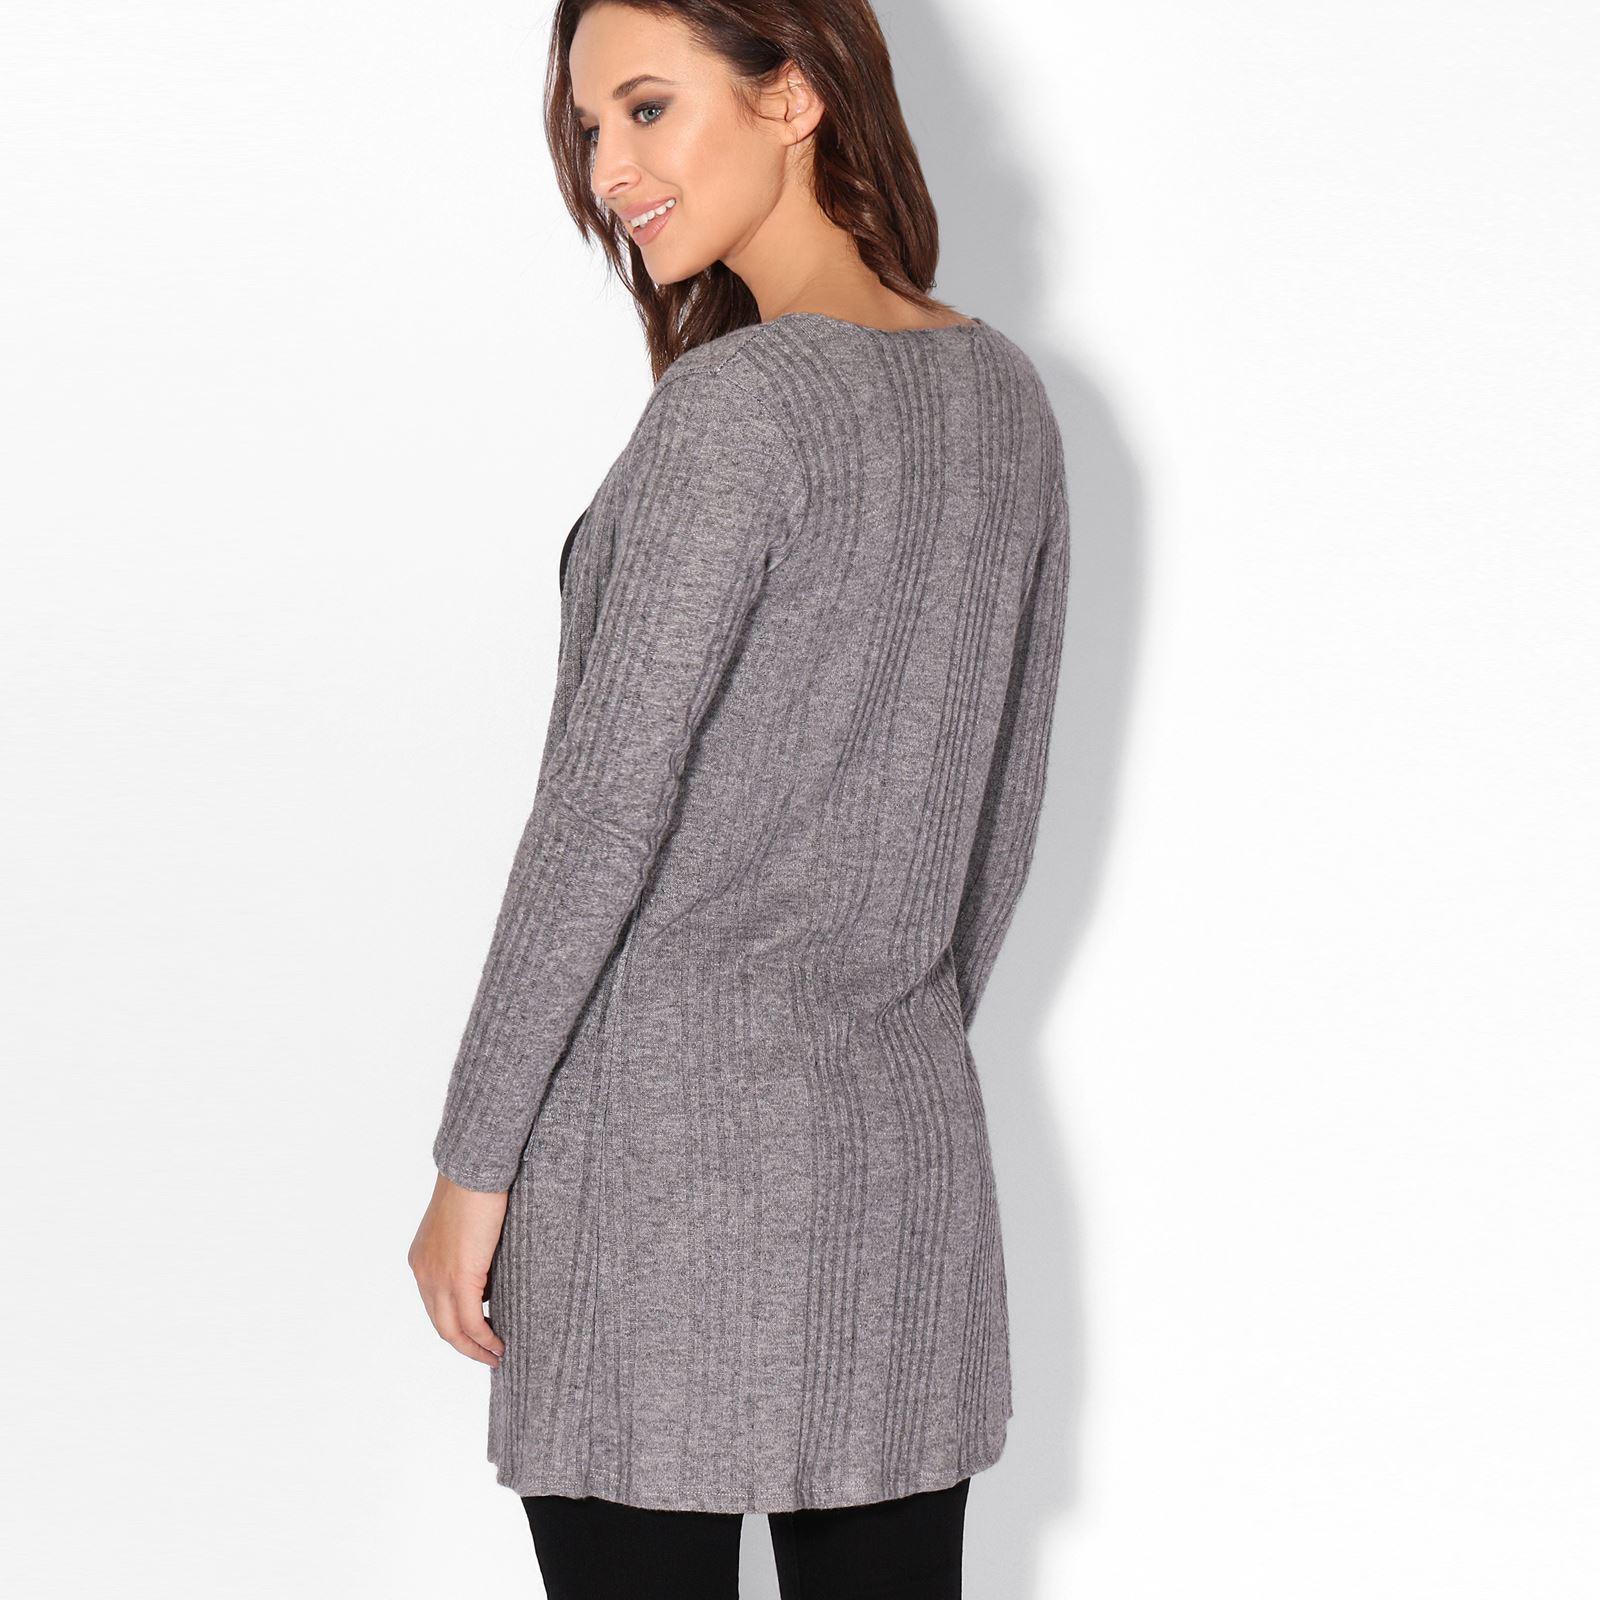 Femmes-Cardigan-Gilet-Long-Manches-Longues-Elegant-Mode-Basique-Casual-Jumper miniature 5